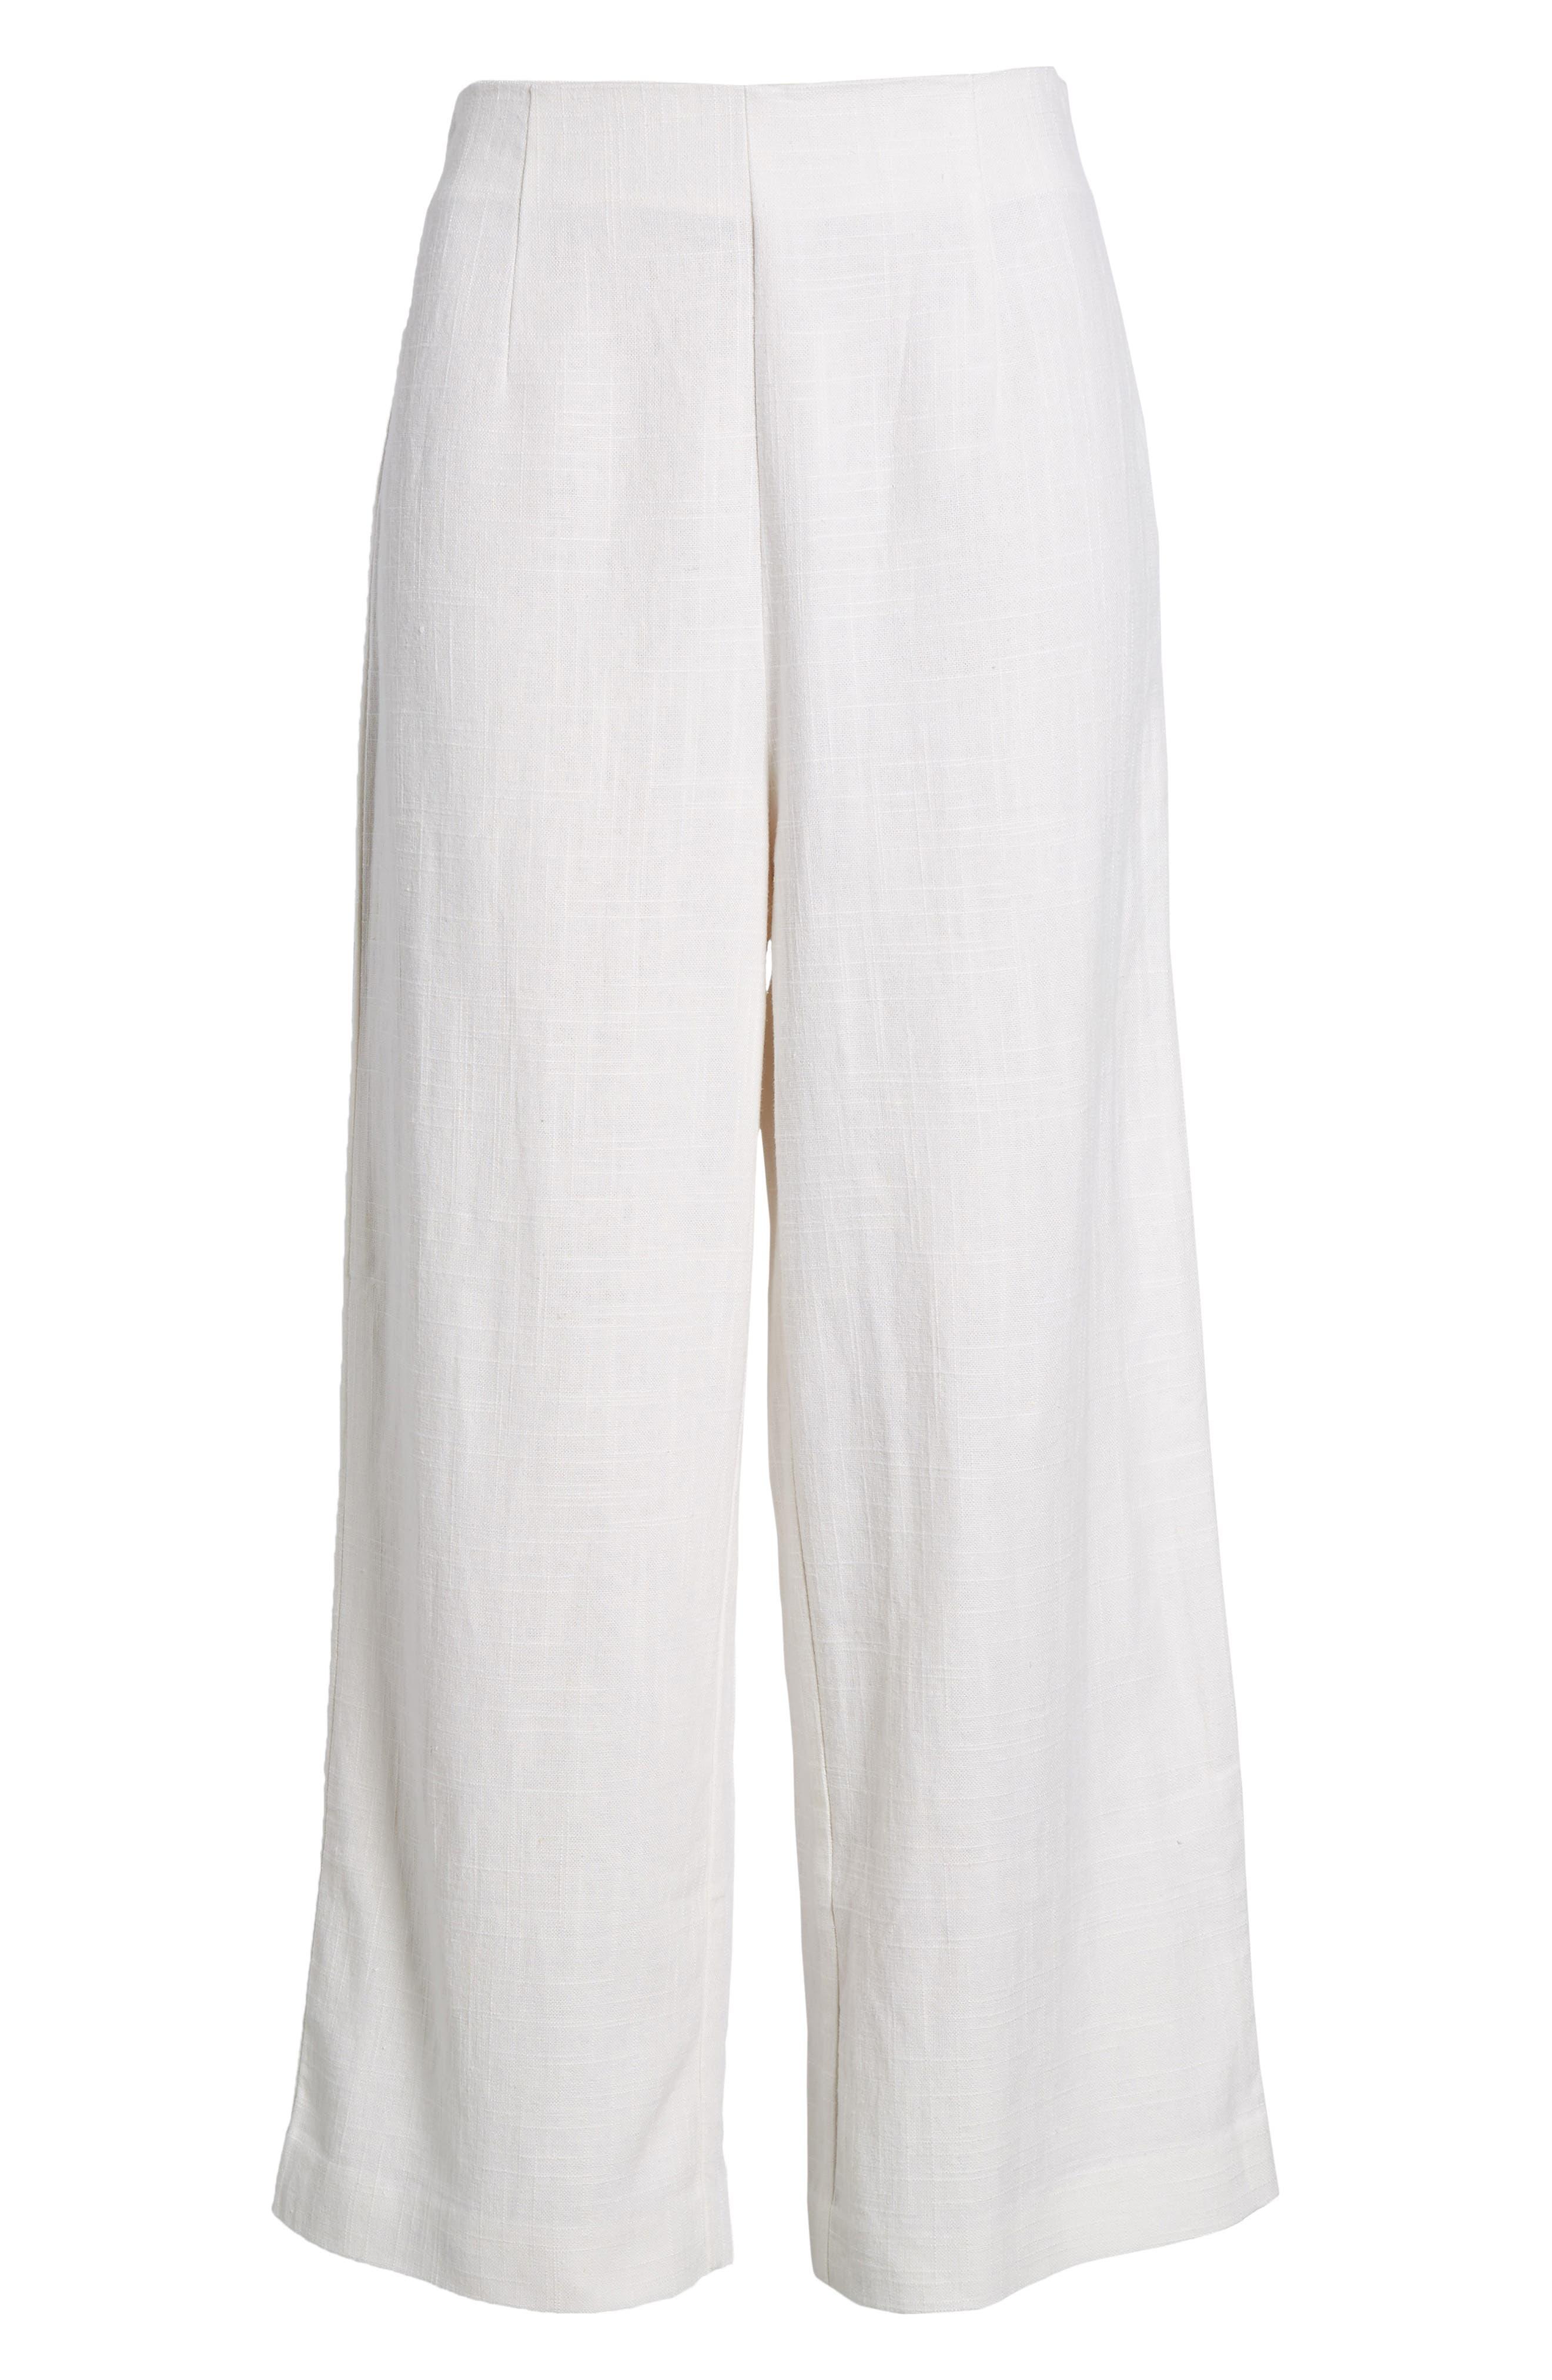 Linen High Waist Crop Pants,                             Alternate thumbnail 7, color,